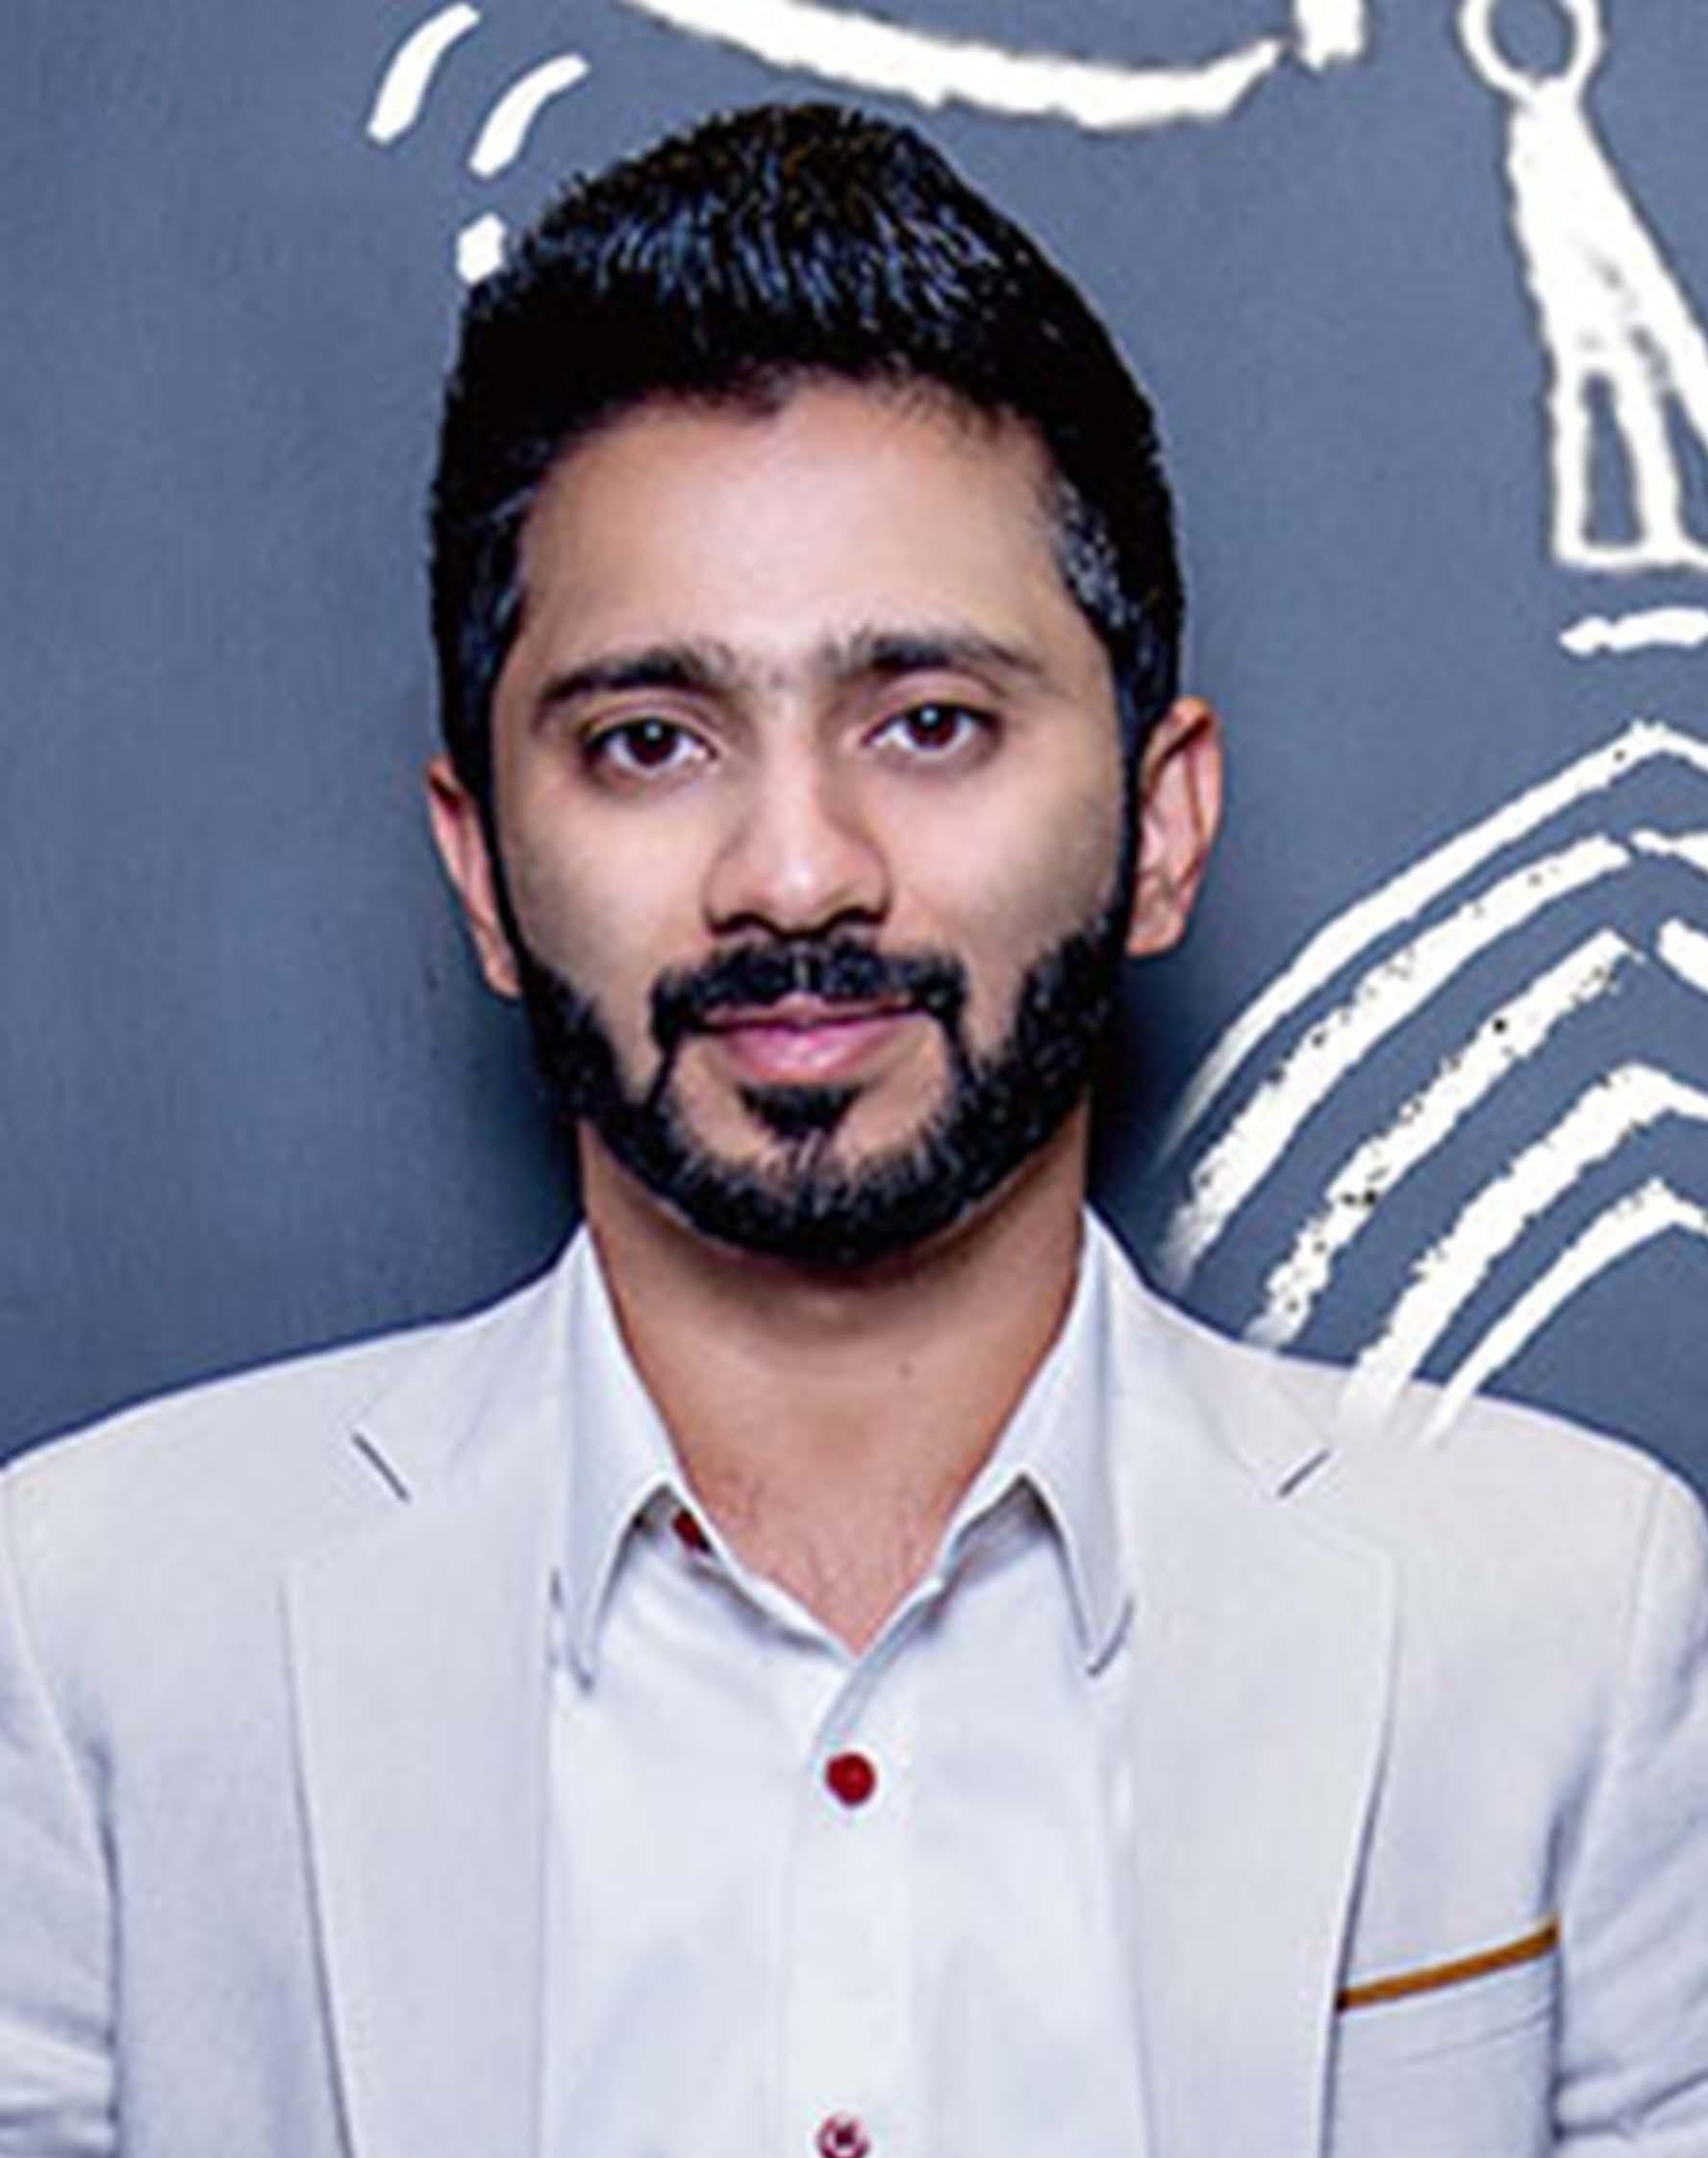 Shekhar-A-Bhattacharjee